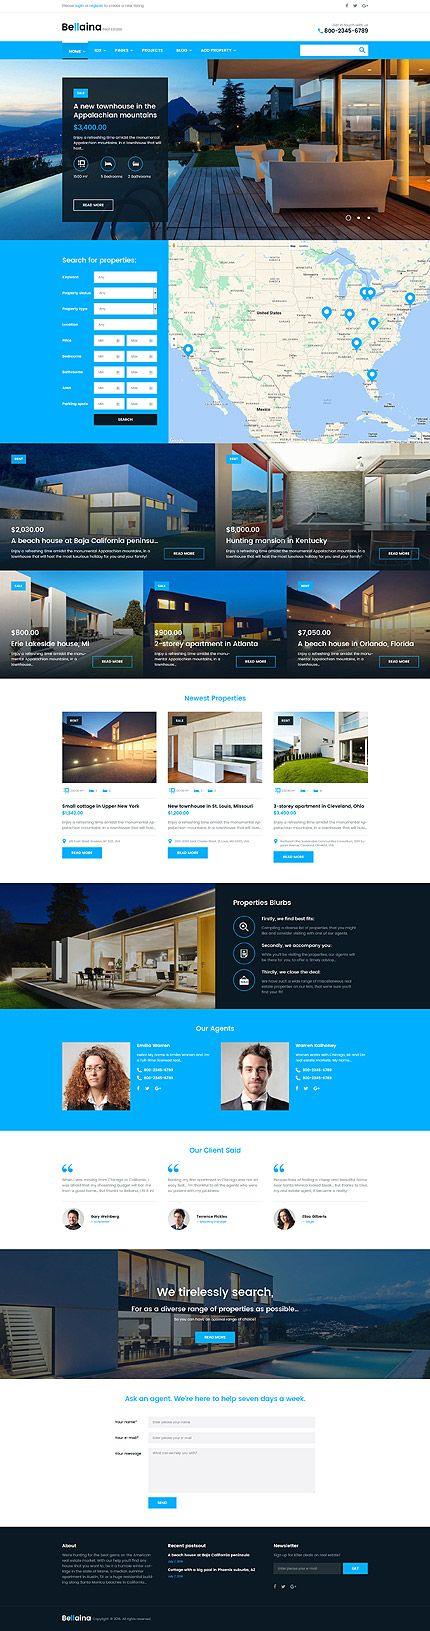 A real estate responsive WordPress theme like